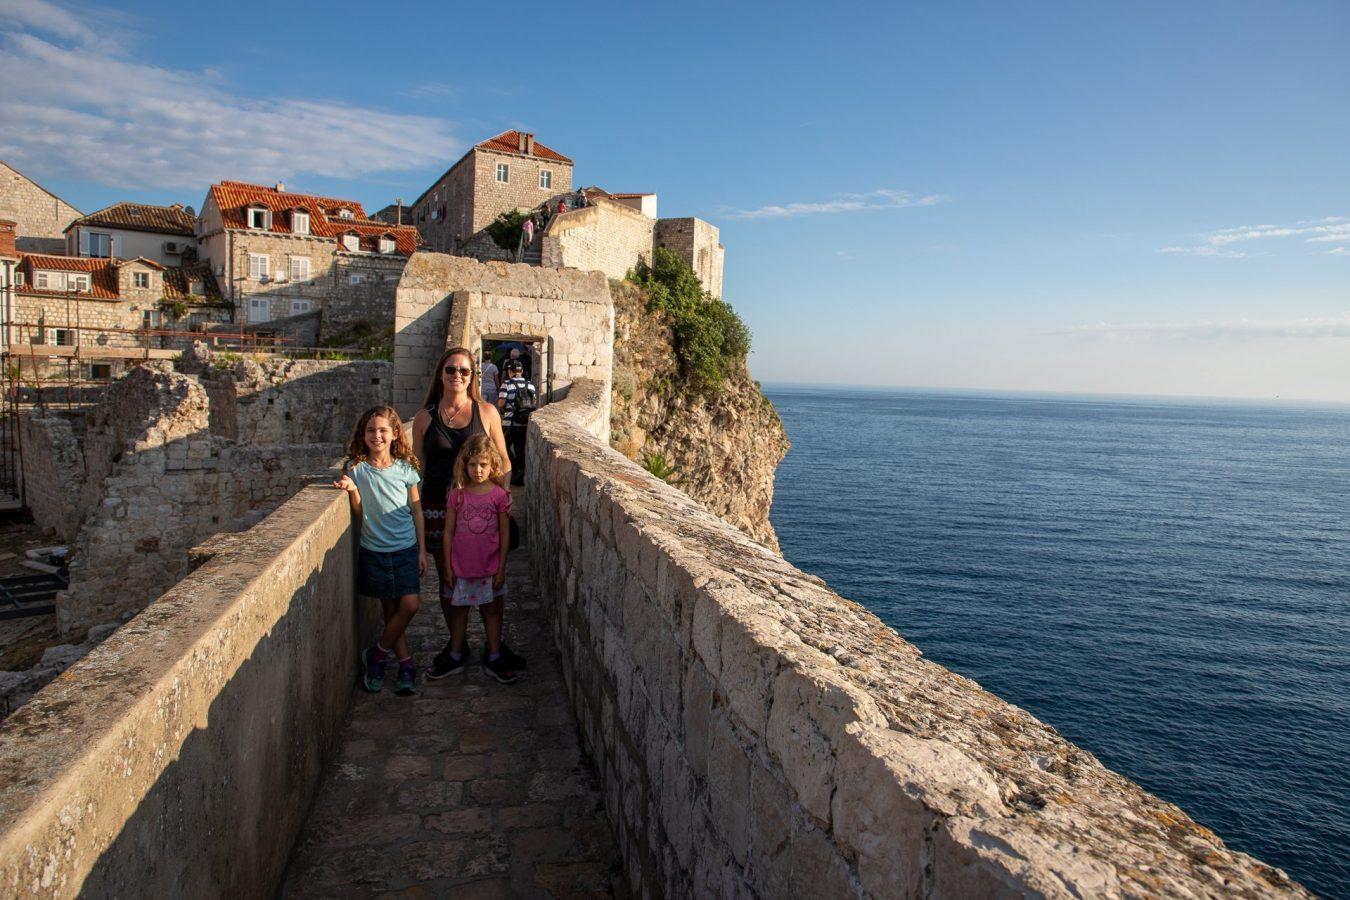 Walking the Dubrovnik city walls